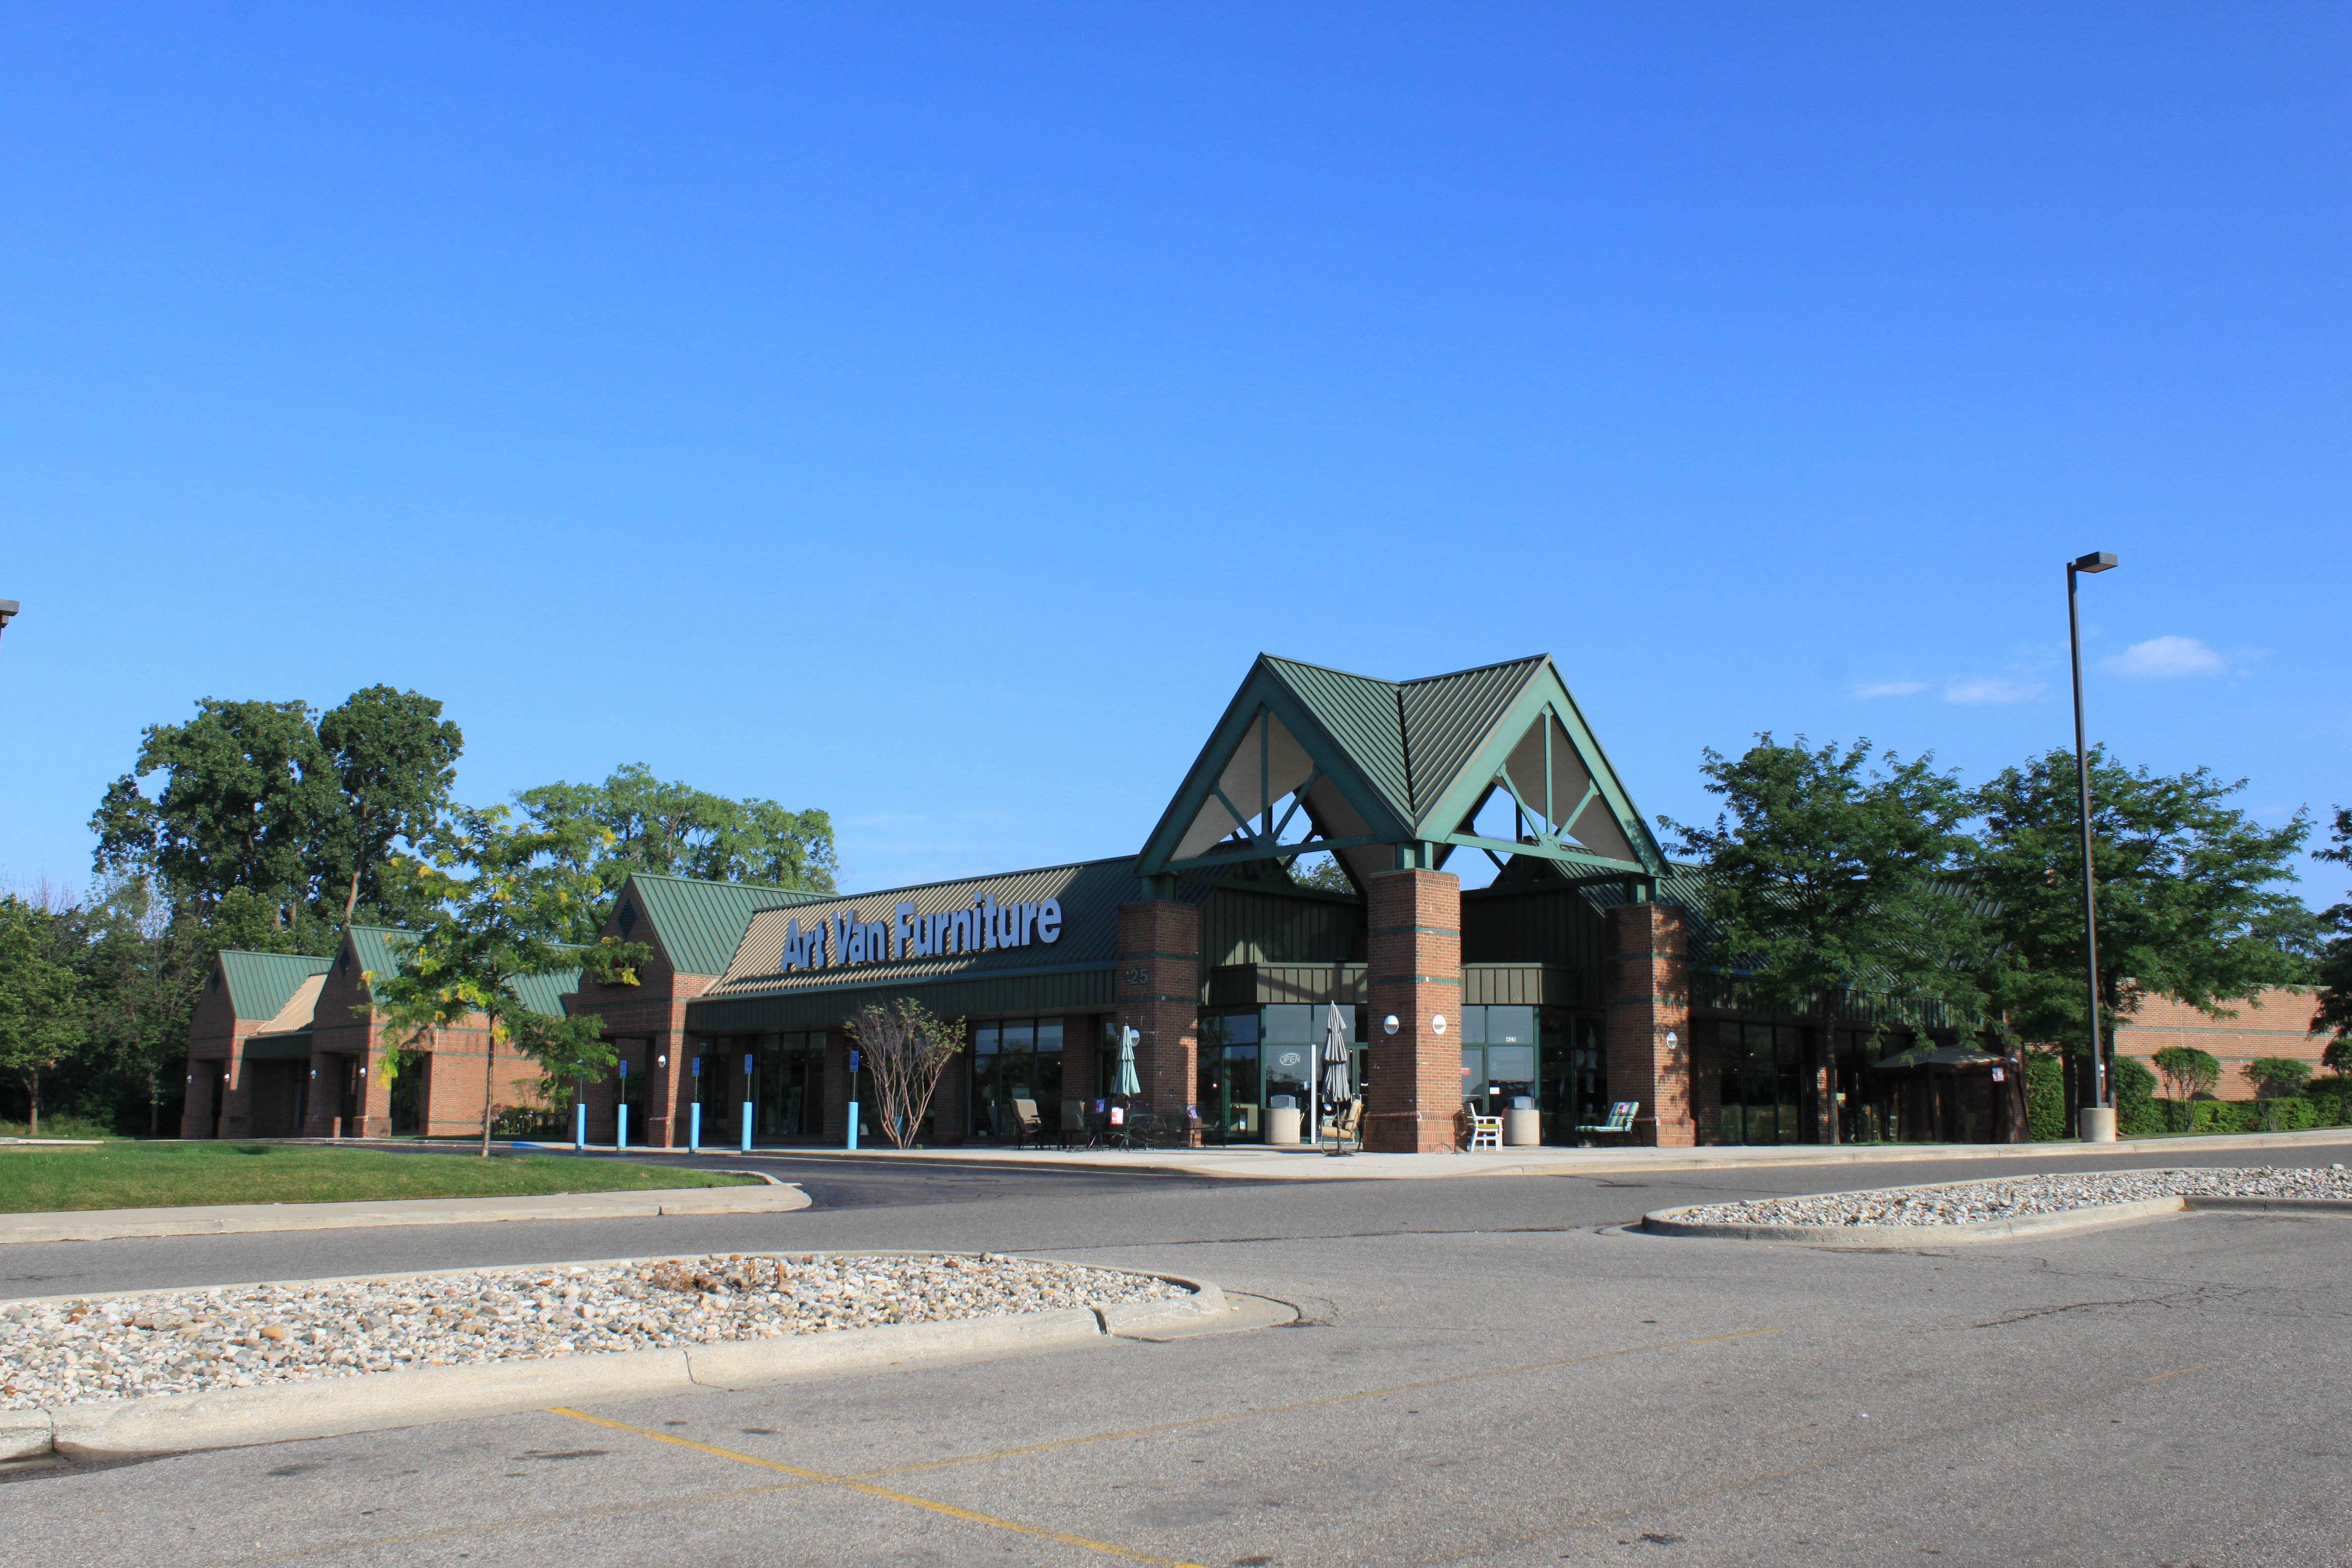 Perfect File:Art Van Furniture, 425 East Eisenhower Parkway, Ann Arbor, Michigan